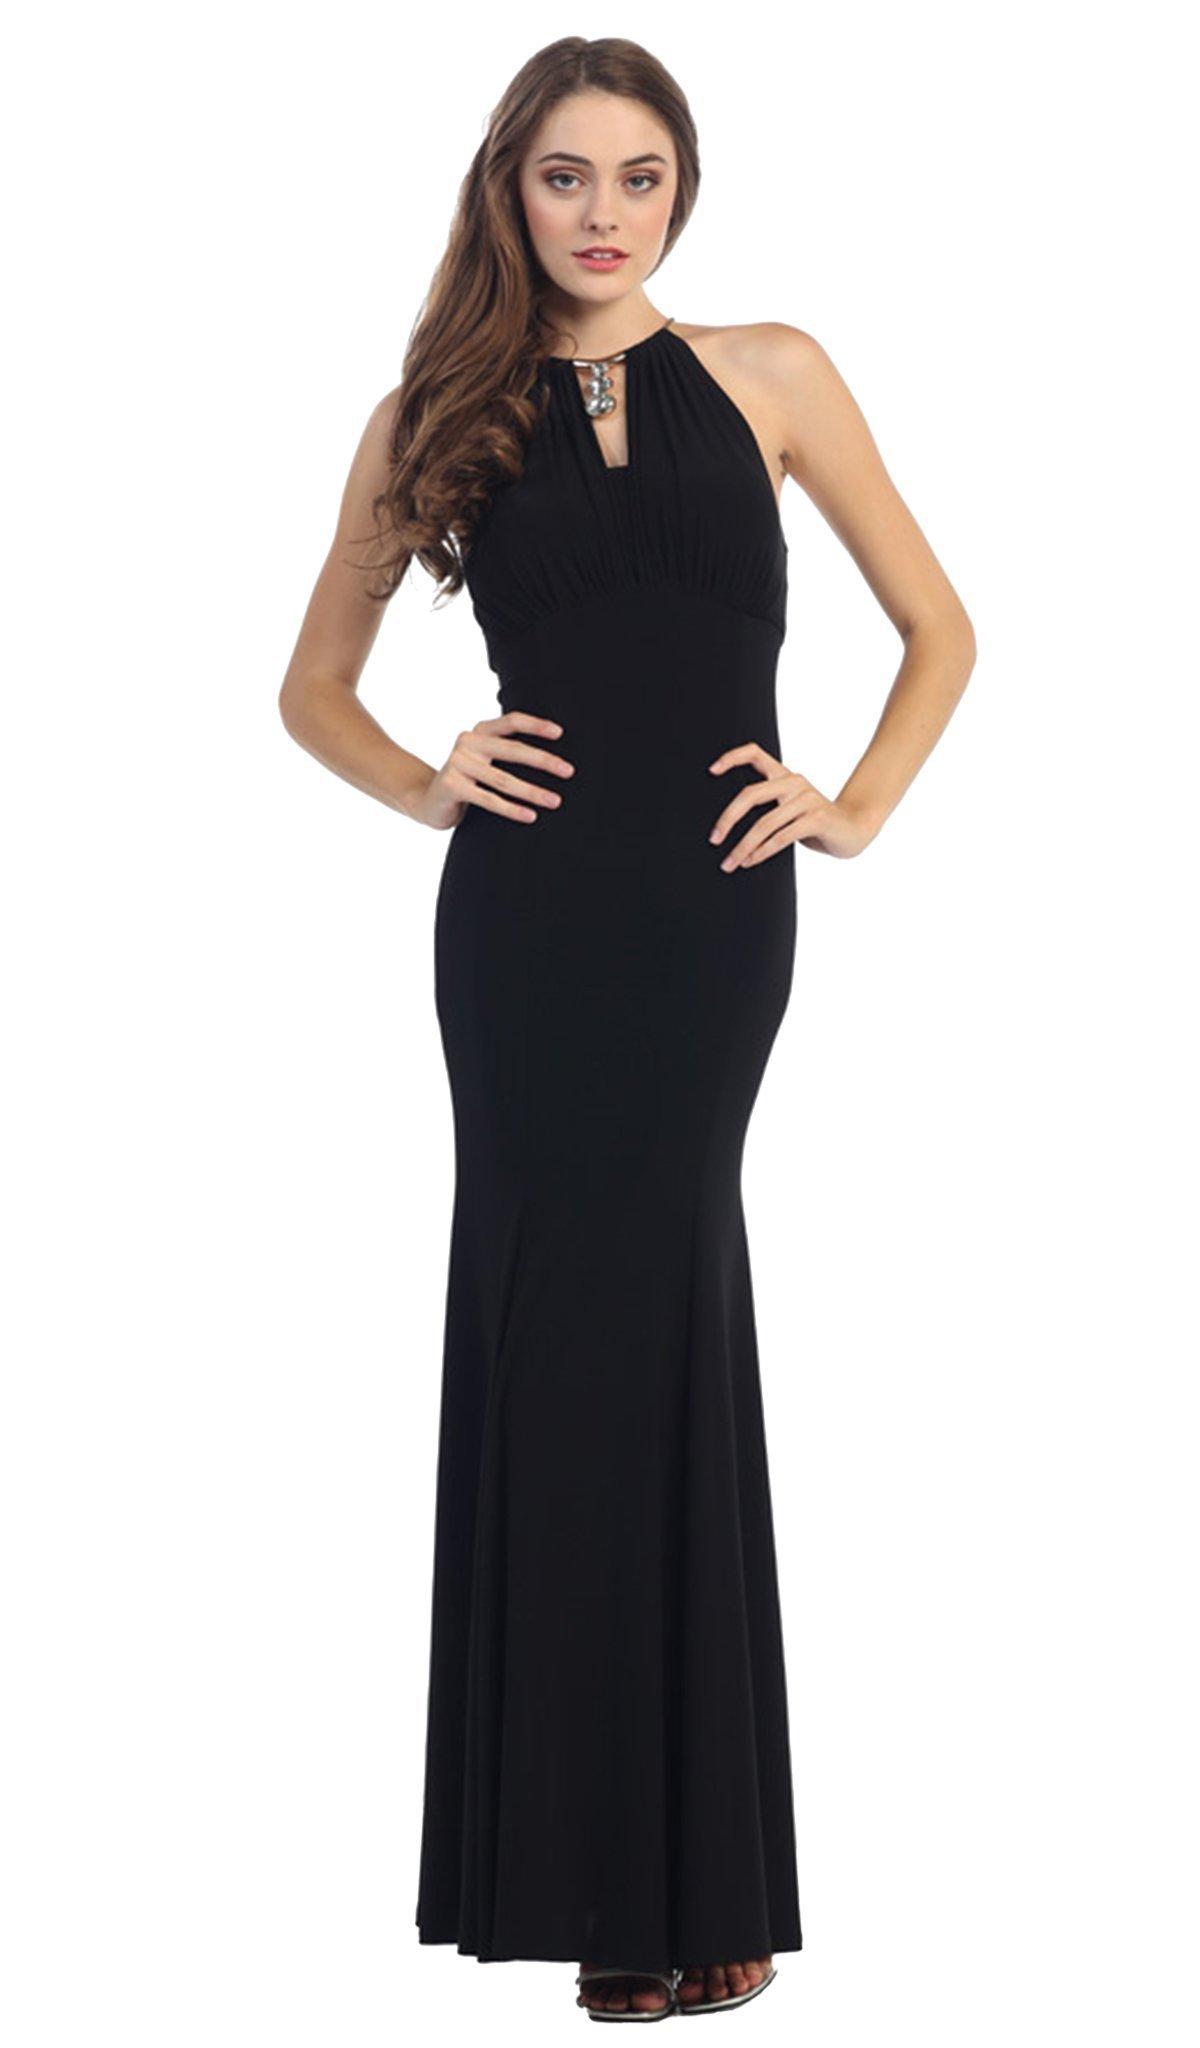 Eureka Fashion - Jeweled Pendant Ornate High Halter Evening Gown